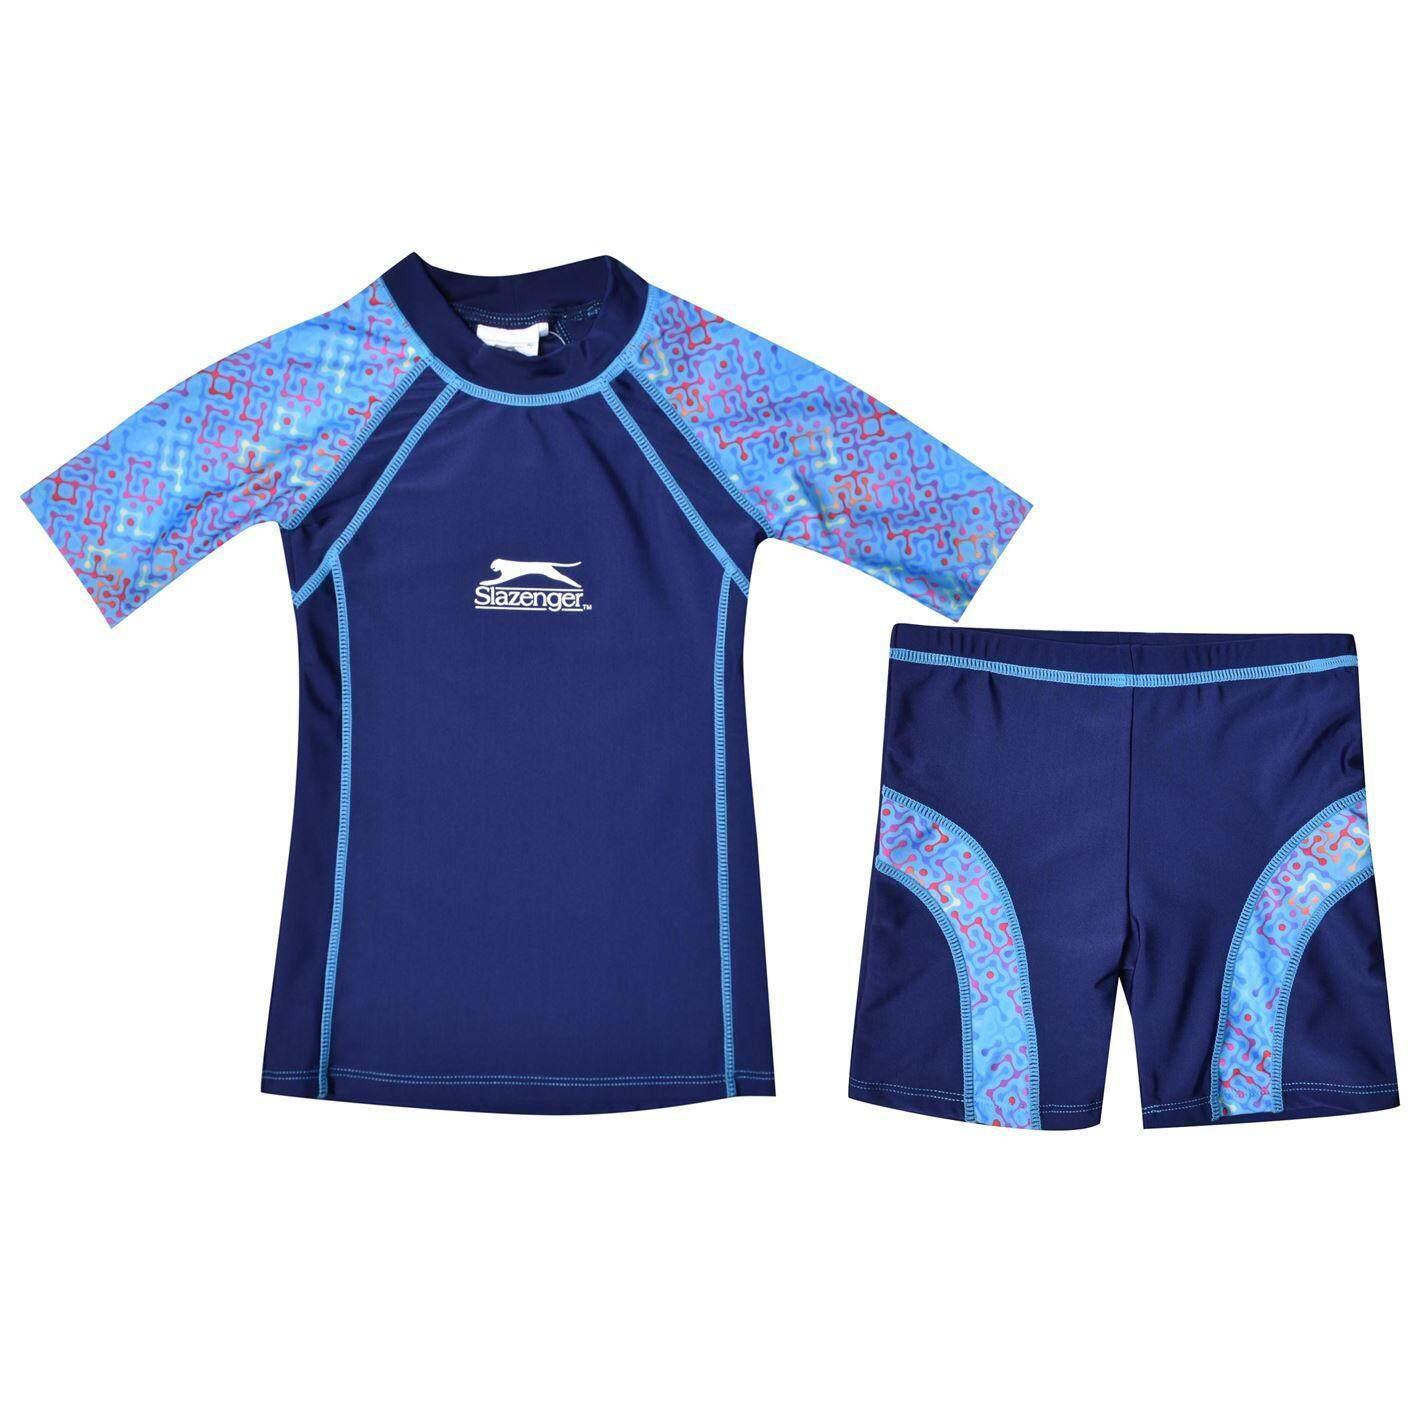 fff727c354 Swim Shirt Infant - DREAMWORKS